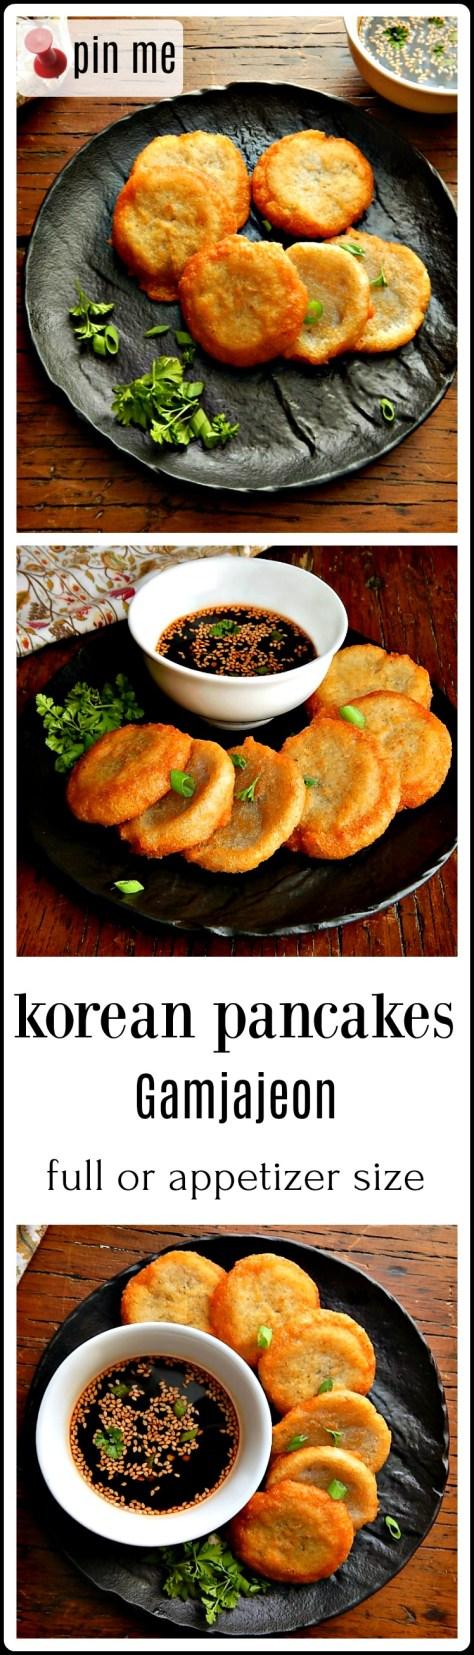 Korean Pancakes - crispy, crunchy deliciousness with a creamy center. Like the best latkes, ever!